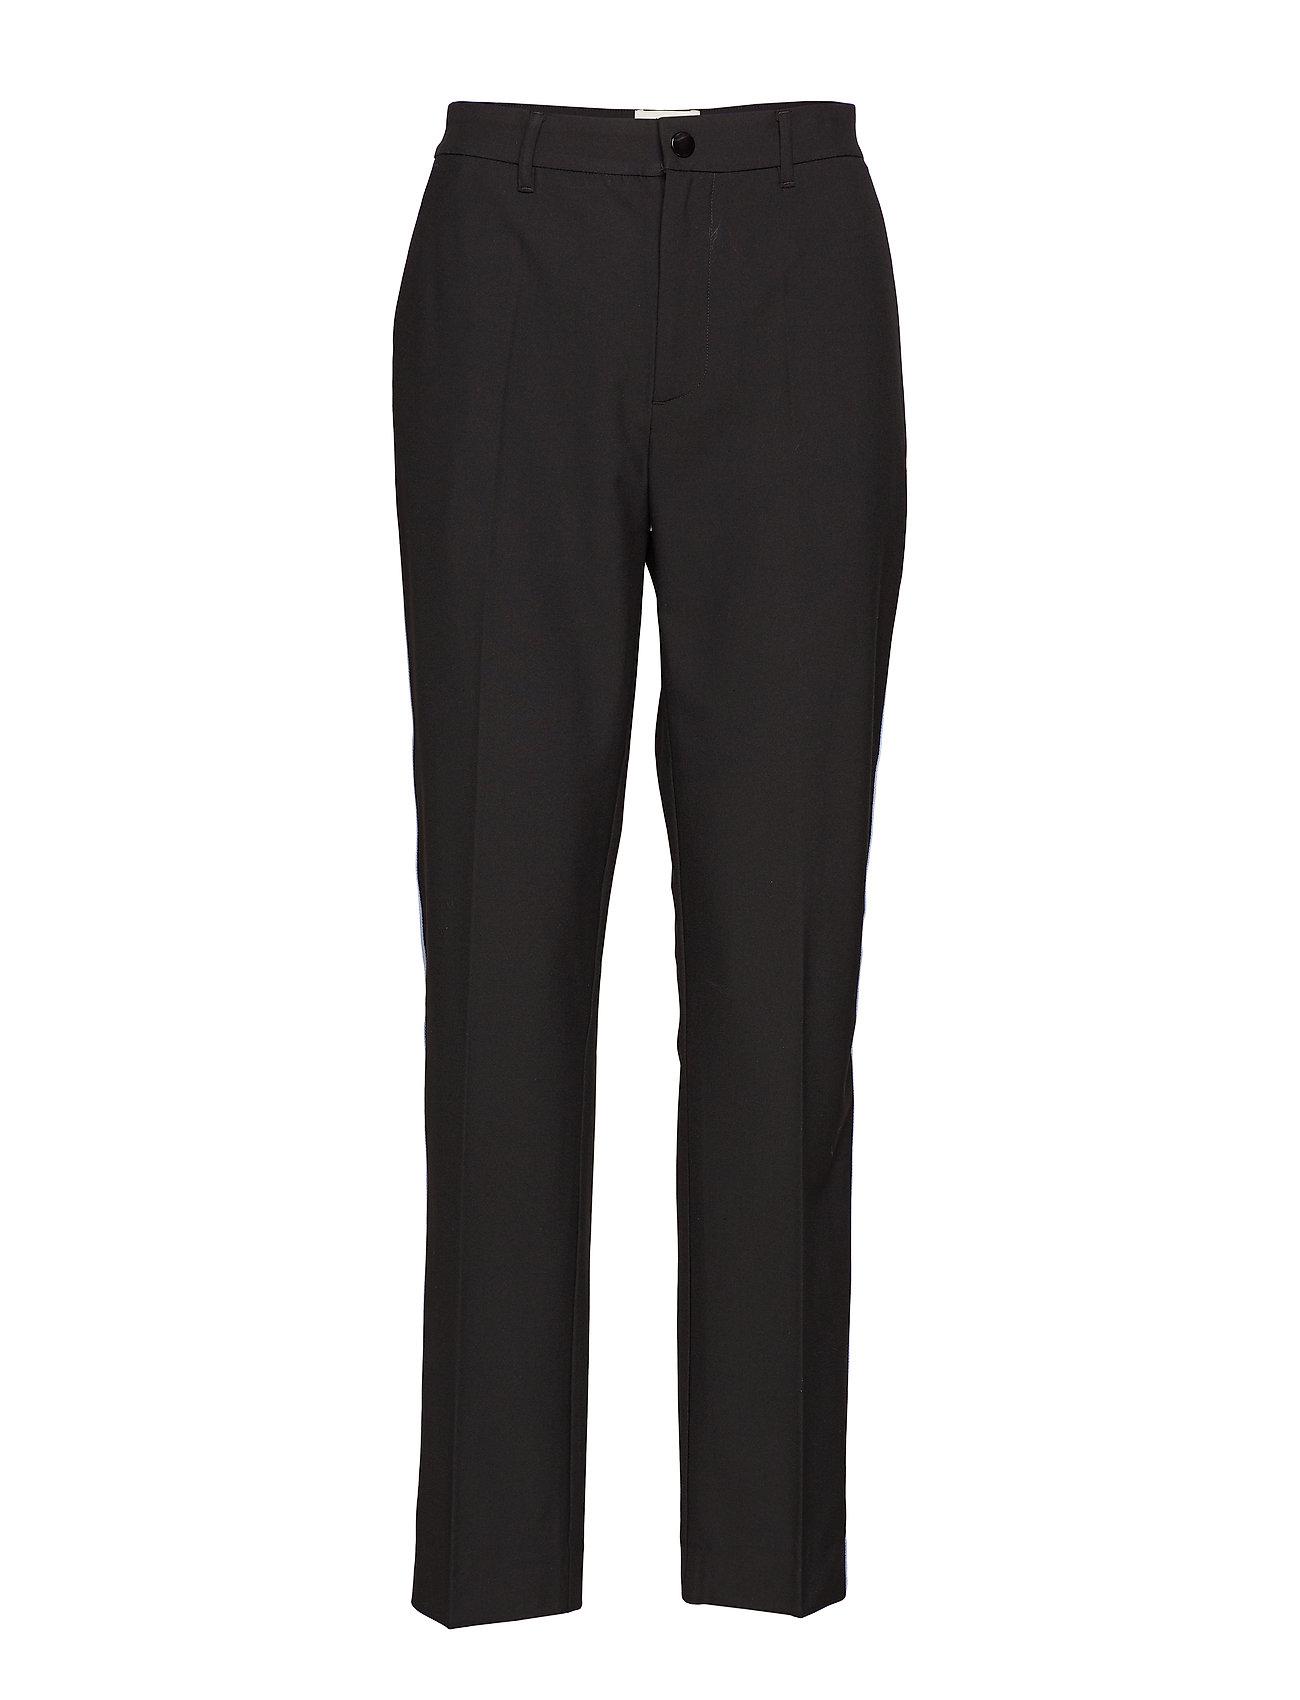 Mads Nørgaard Sportina Panty - BLACK/SKY BLUE